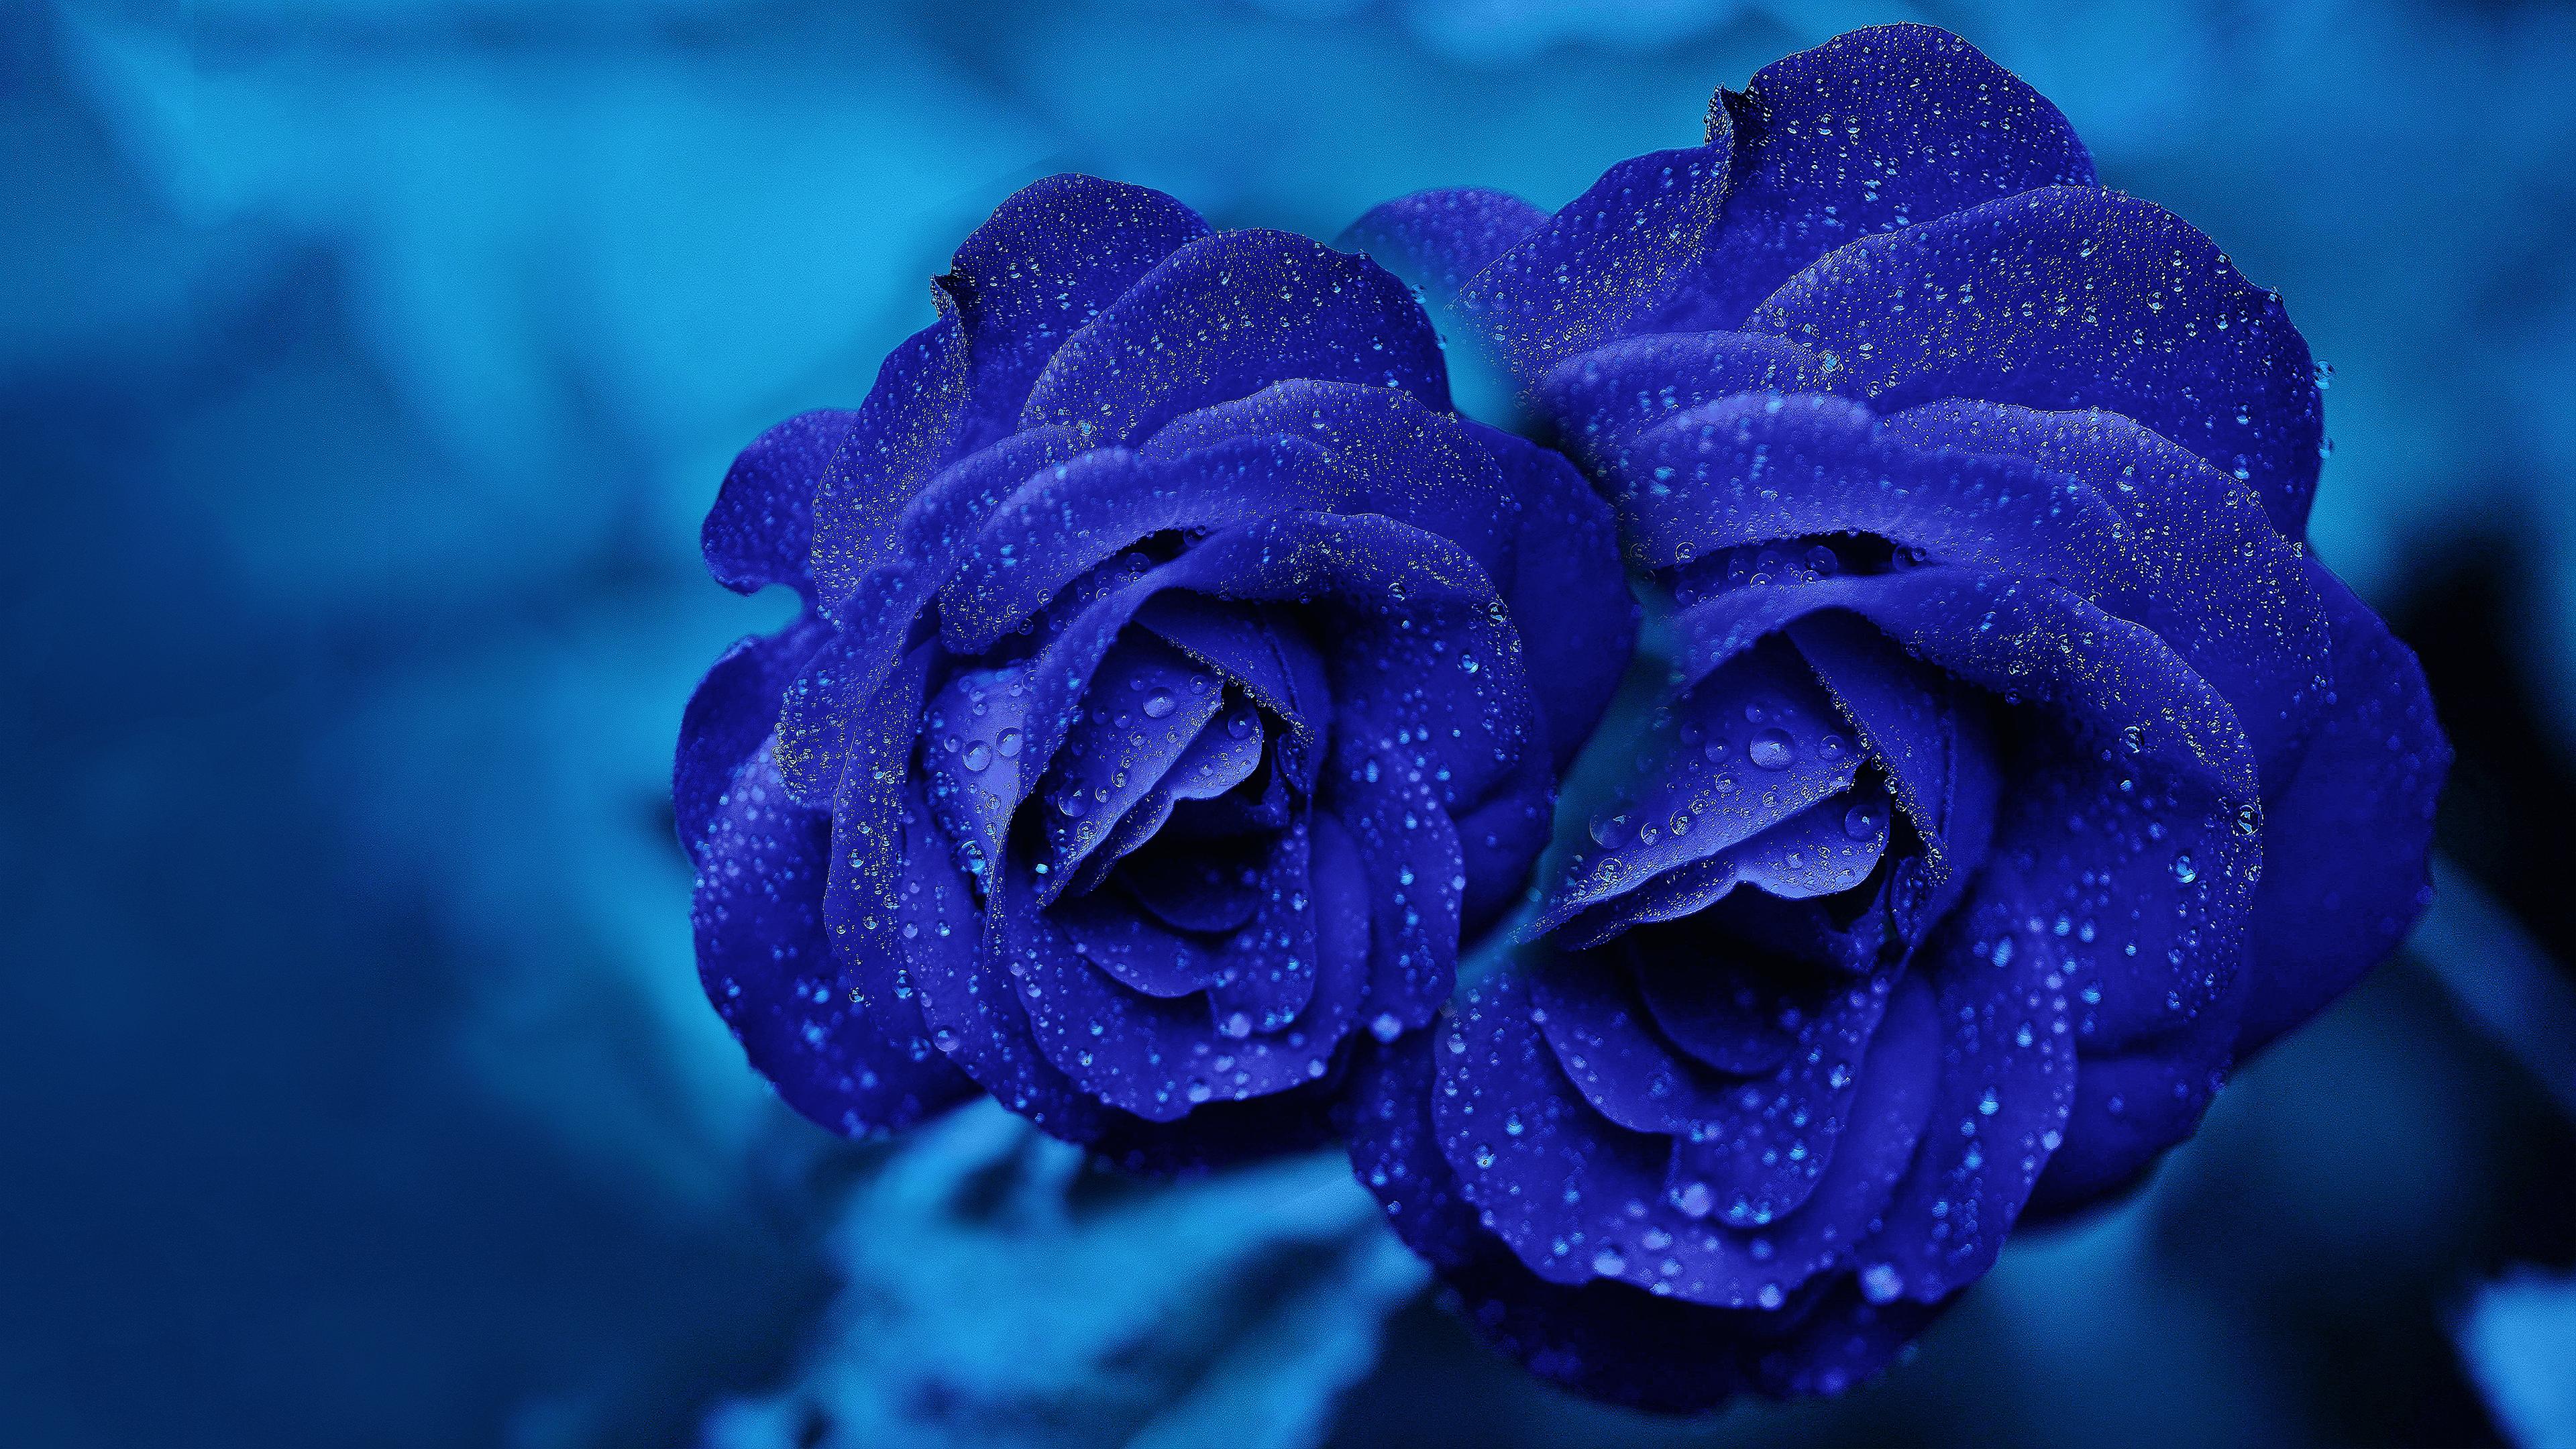 4k rose wallpapers top free 4k rose backgrounds - Blue rose hd wallpaper download ...